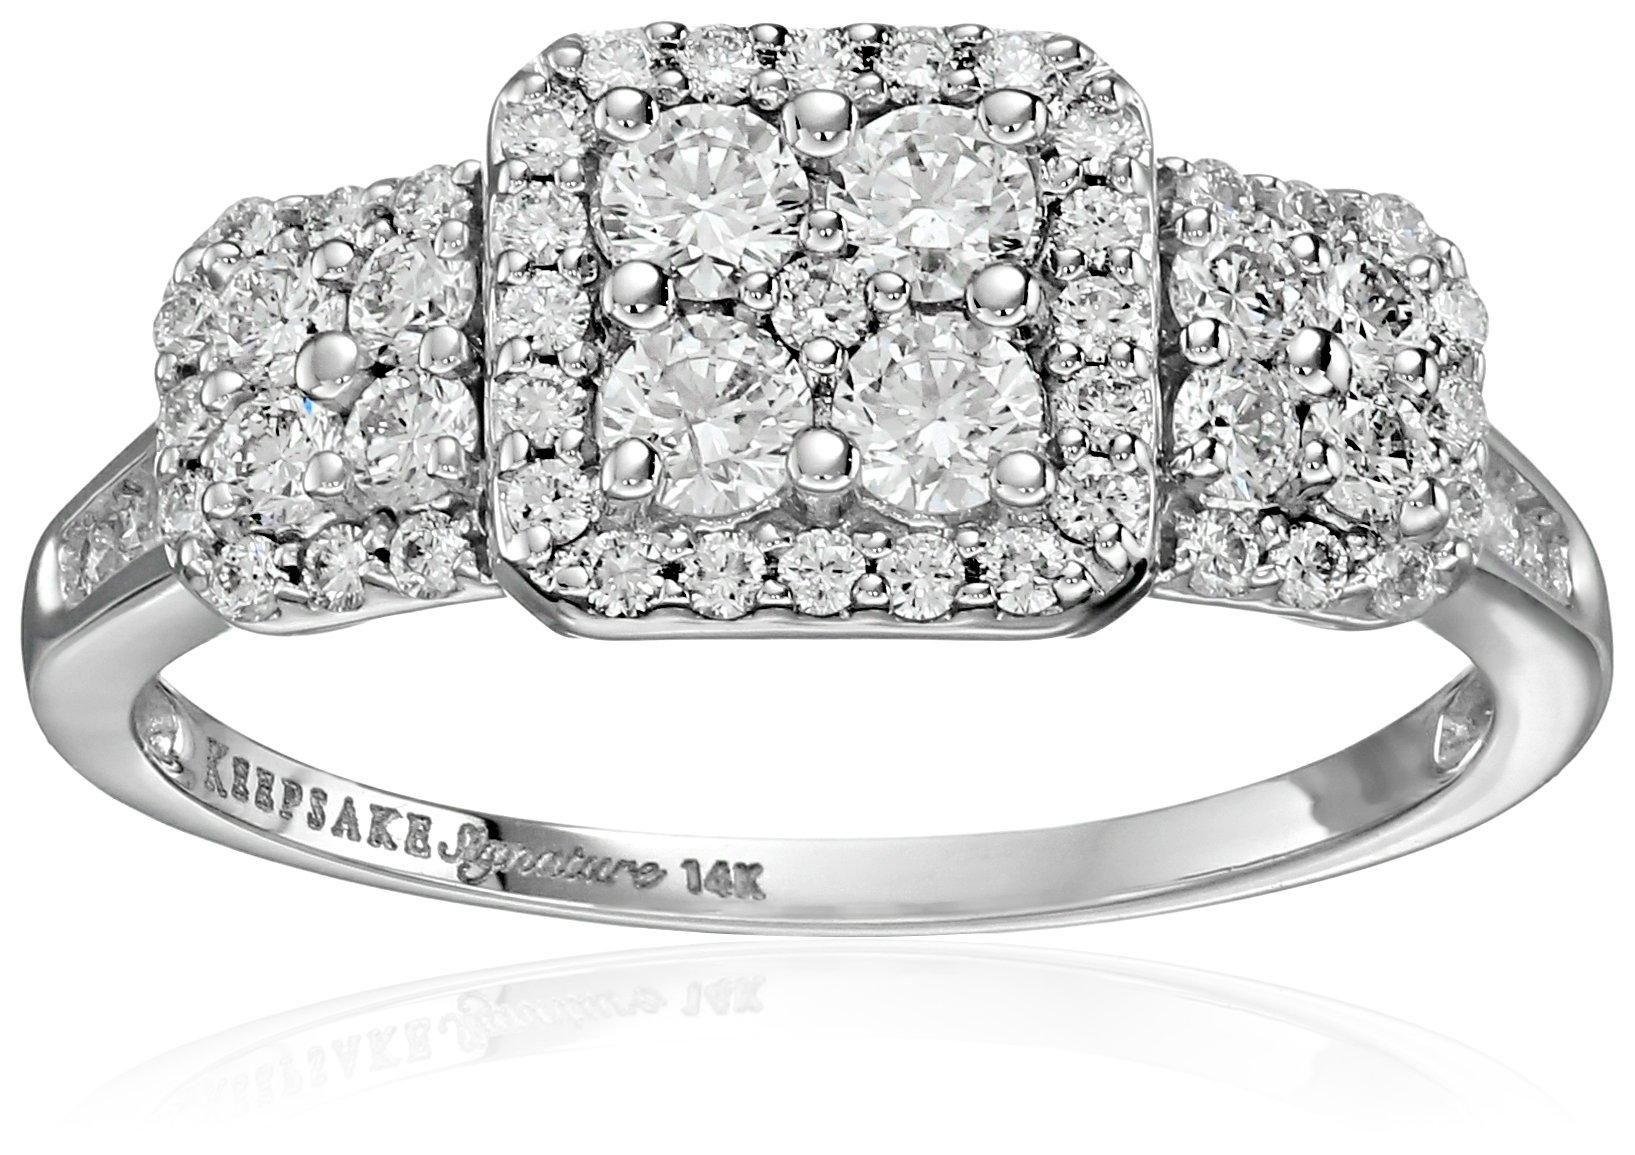 Keepsake Signature 14k White Gold Diamond Three-Stone Engagement Ring (1cttw, H-I Color, I1 Clarity), Size 7 by Amazon Collection (Image #1)